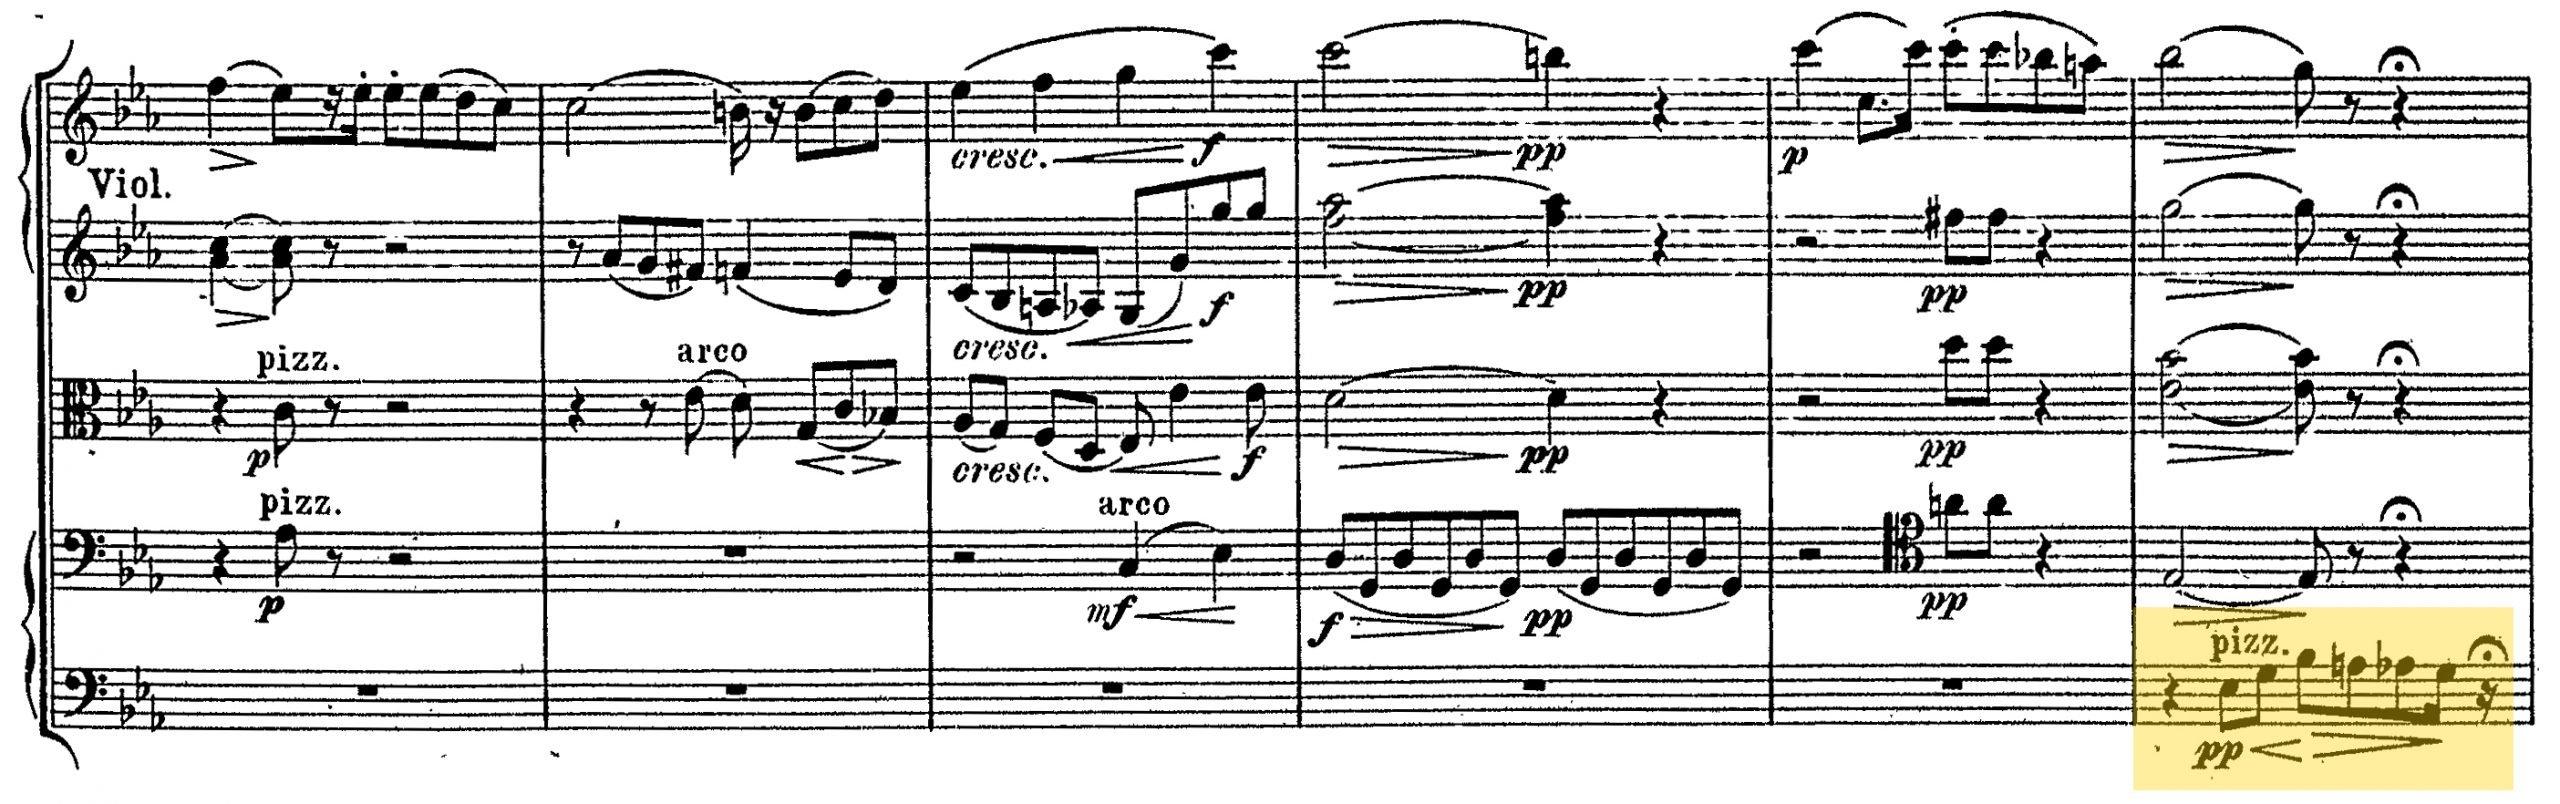 Berlioz Symphonie Fantastique analysis mov 1 ex 3